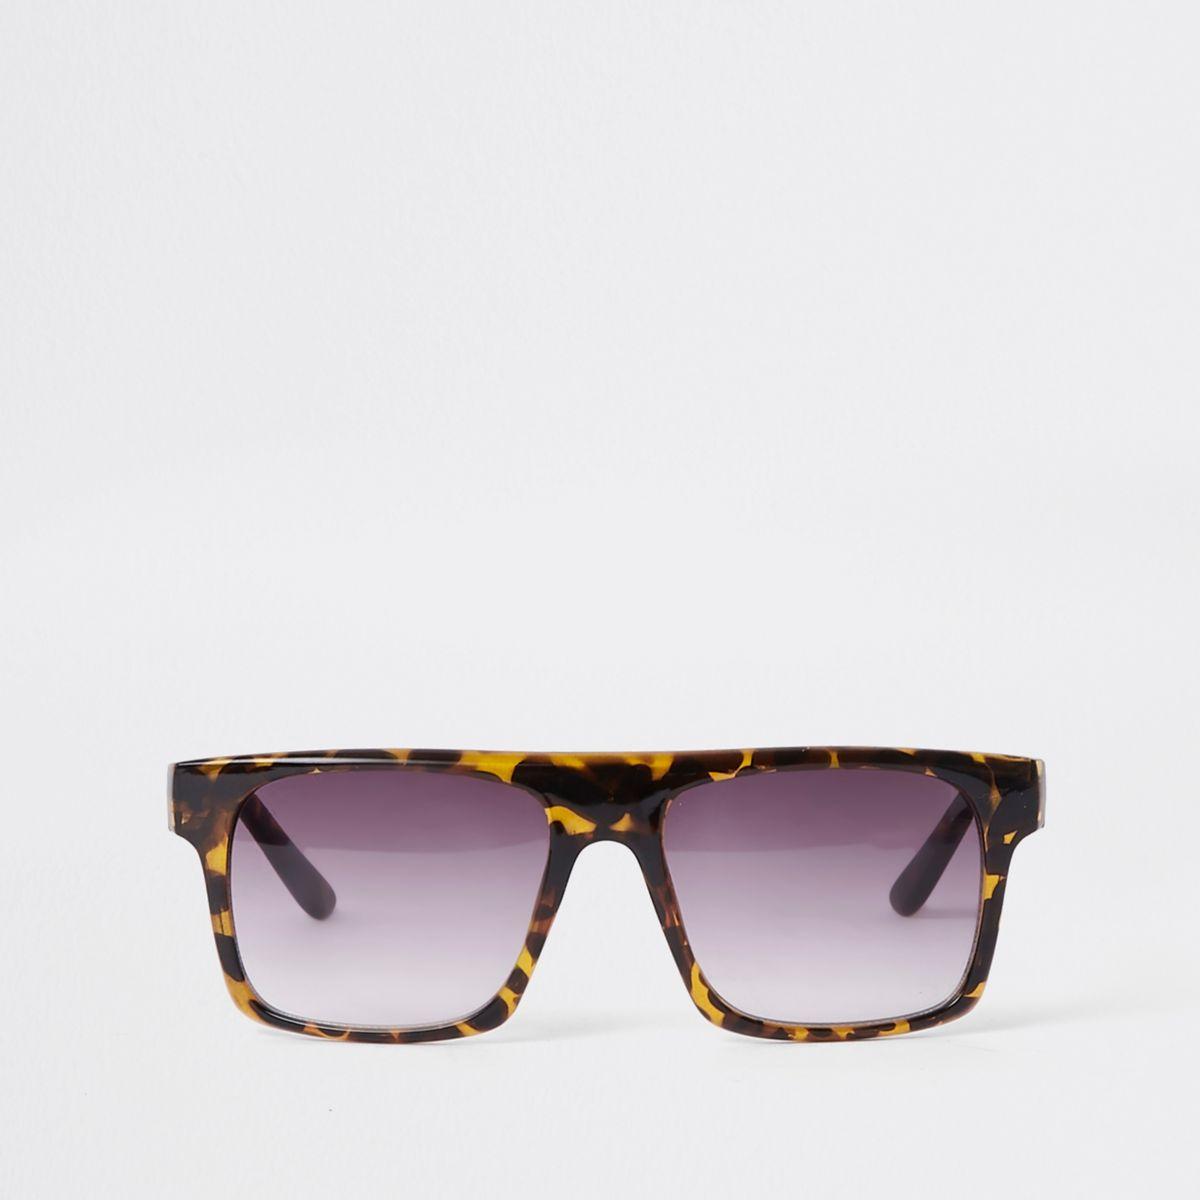 Brown tortoiseshell smoke lens sunglasses